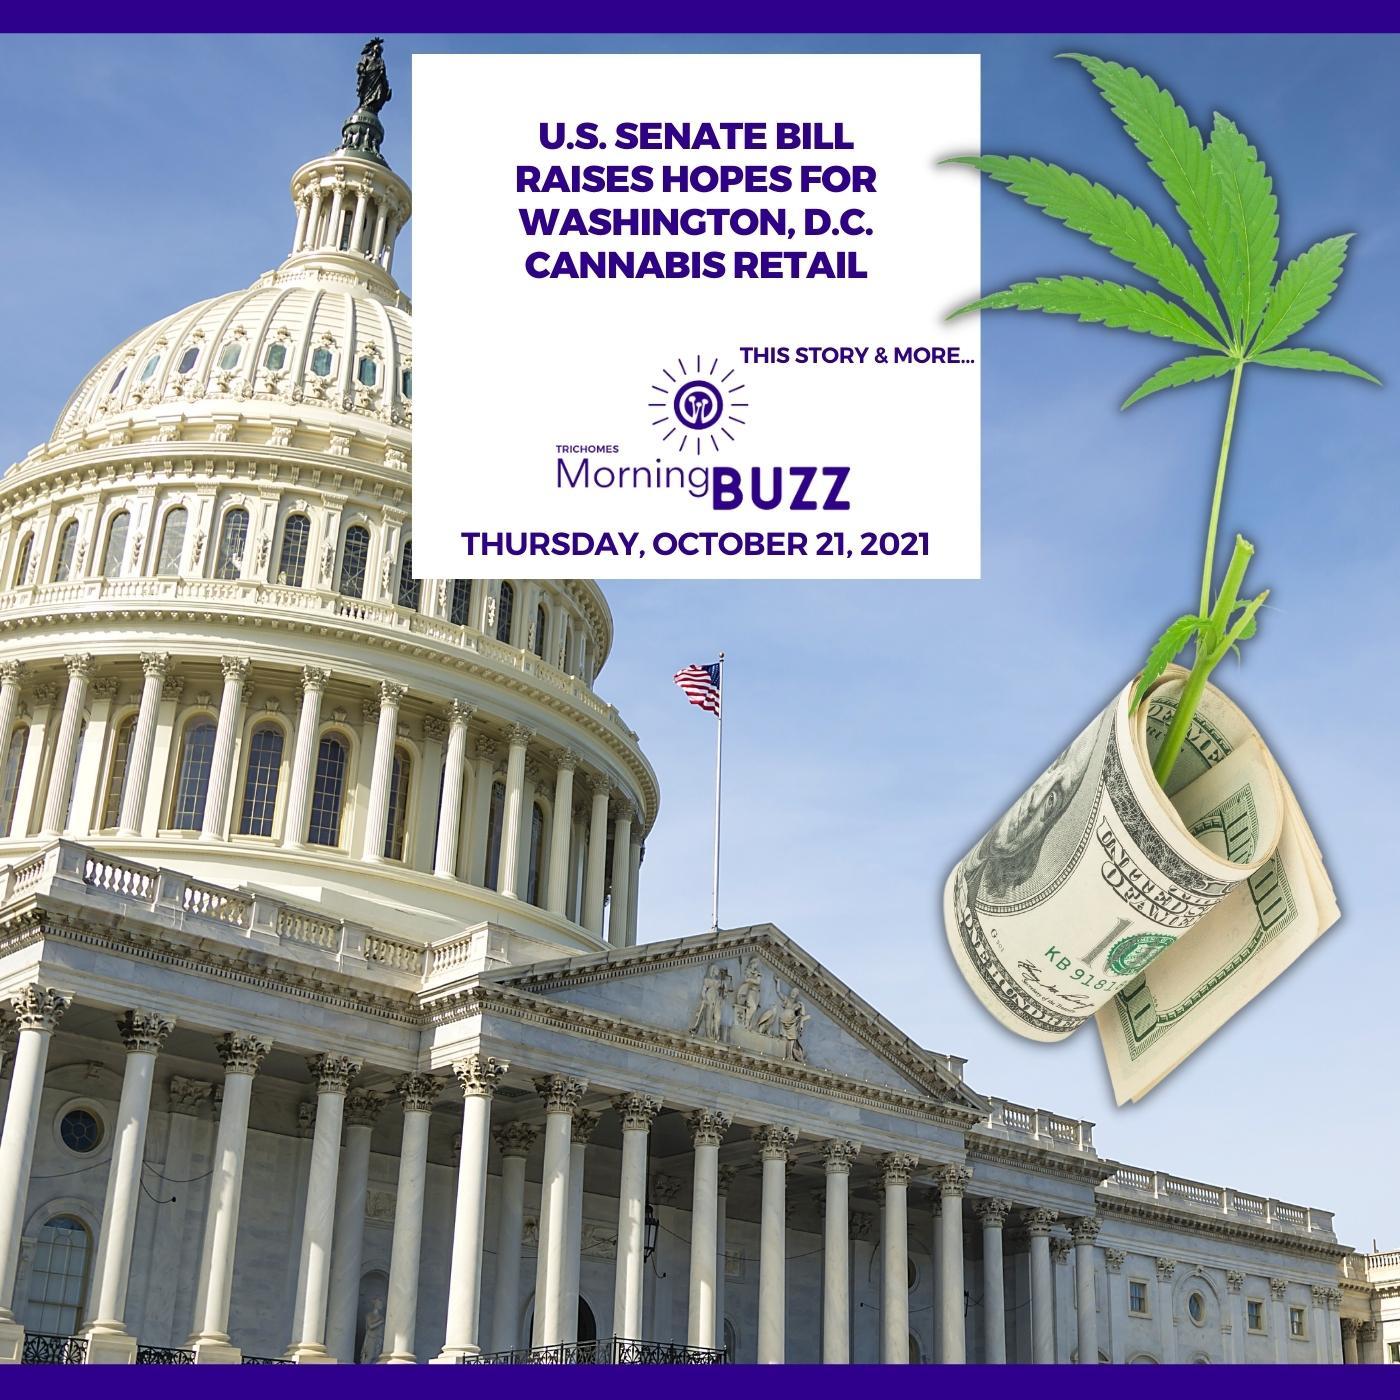 U.S. Senate Bill Raises Hopes For Washington, D.C. Cannabis Retail show art